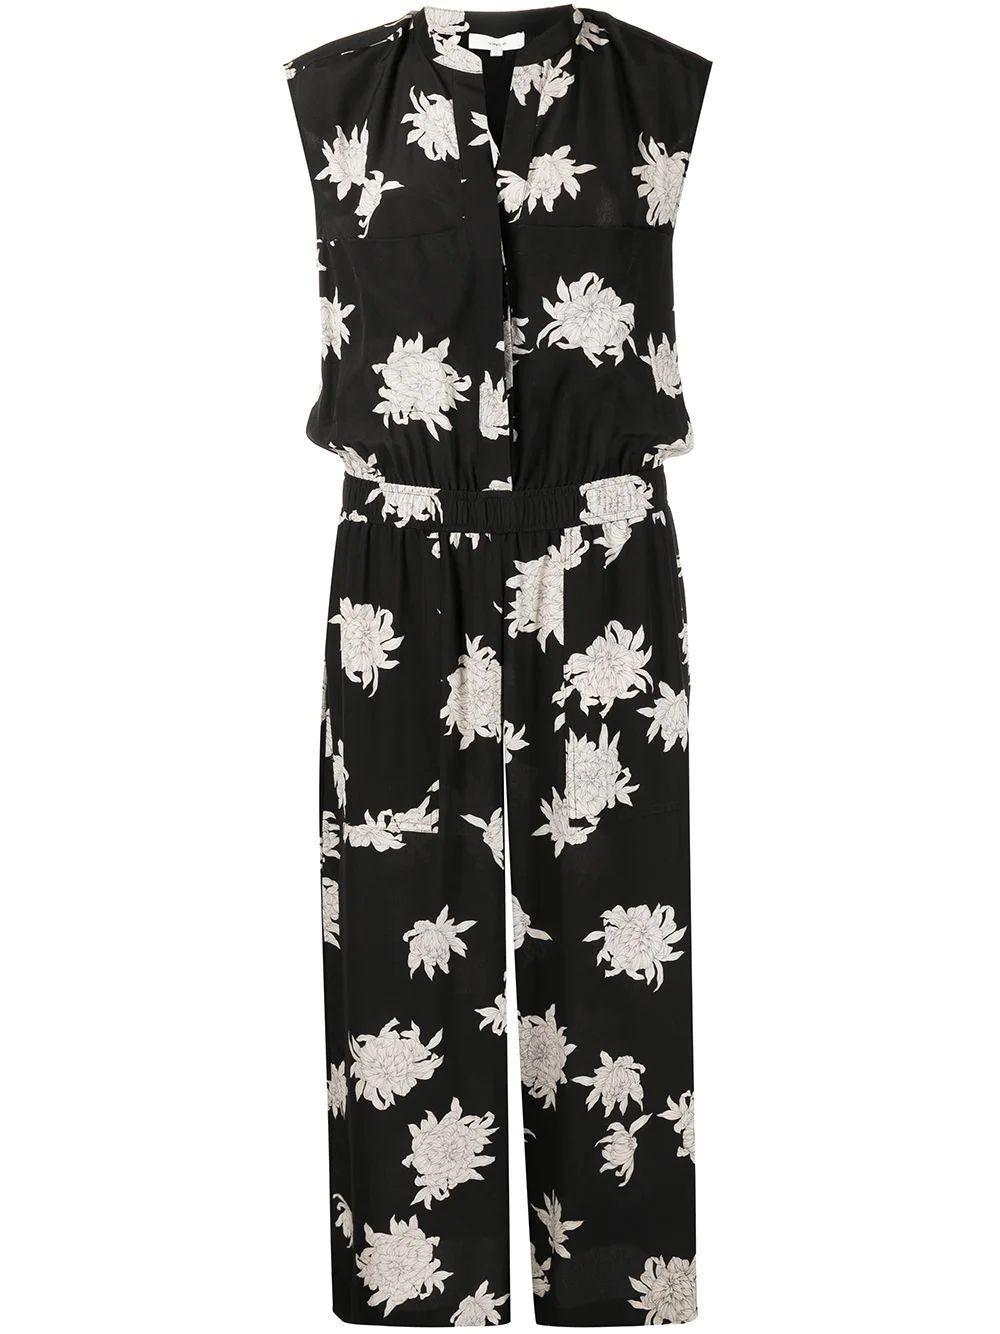 Chrysanthemum Jumpsuit Item # V775121566